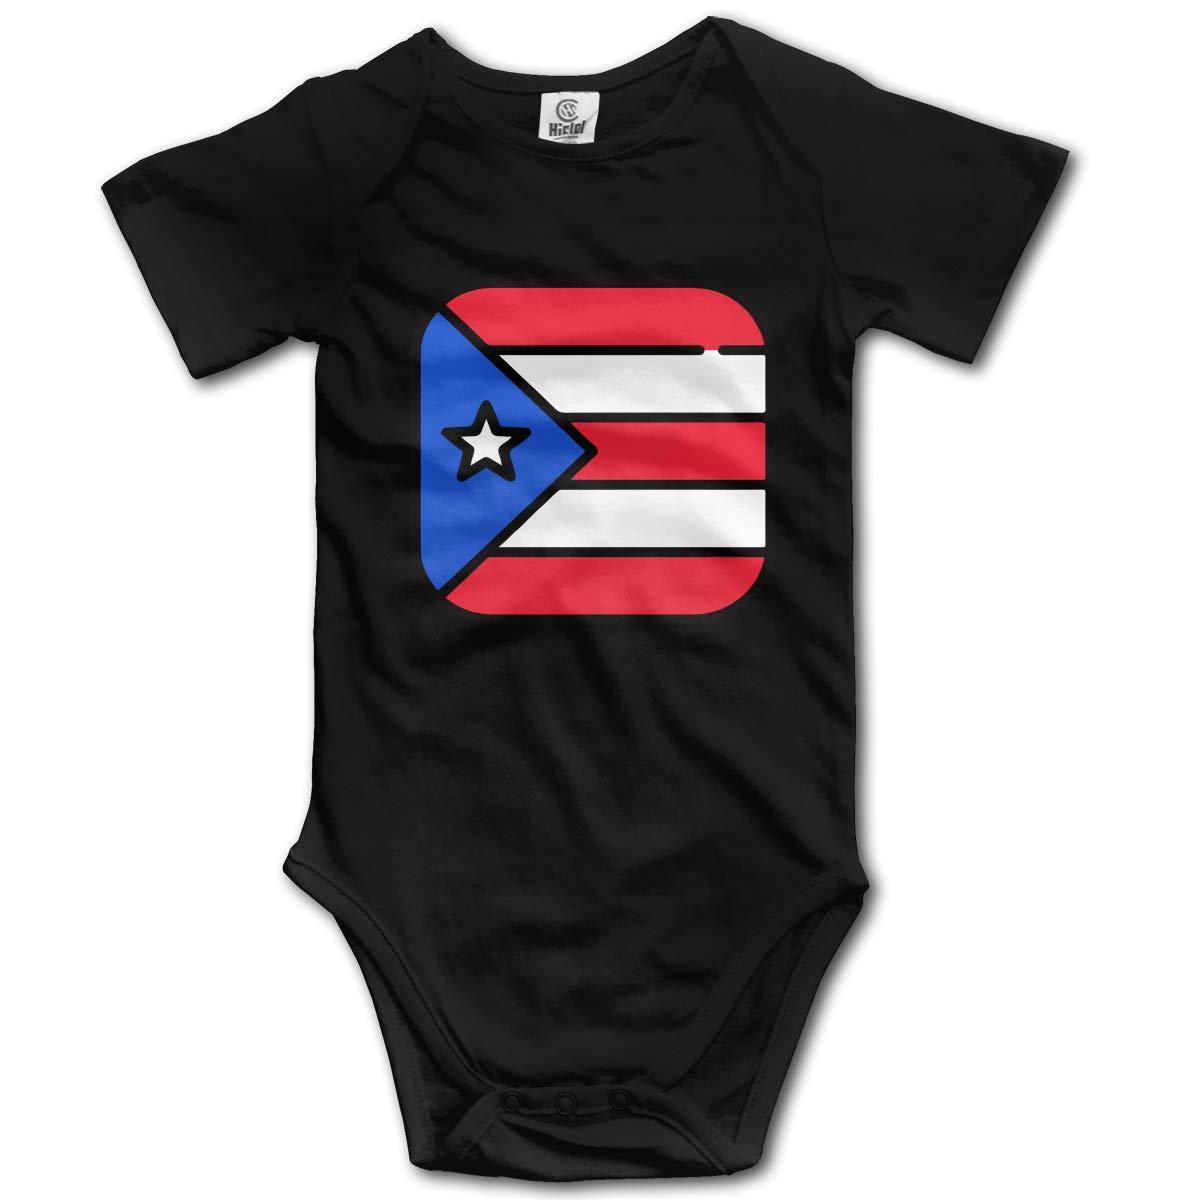 Newborn Puerto Rico Flags 1 Short Sleeve Climbing Clothes Playsuit Suit 6-24 Months